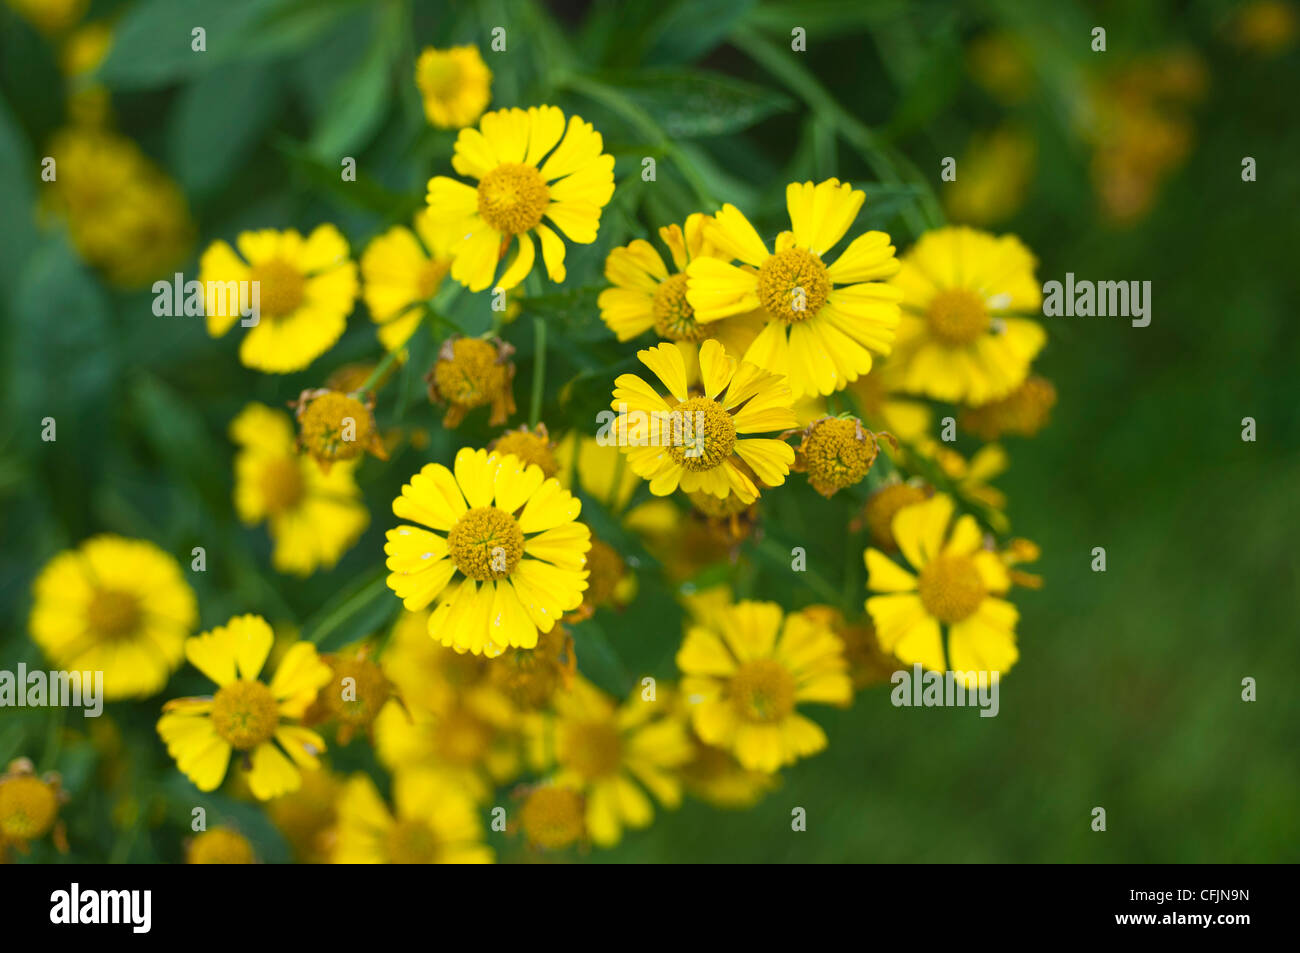 Gelben Blüten der Helenium X Kanaria, Kanarischen Sneezeweed,, Asteraceae Stockbild